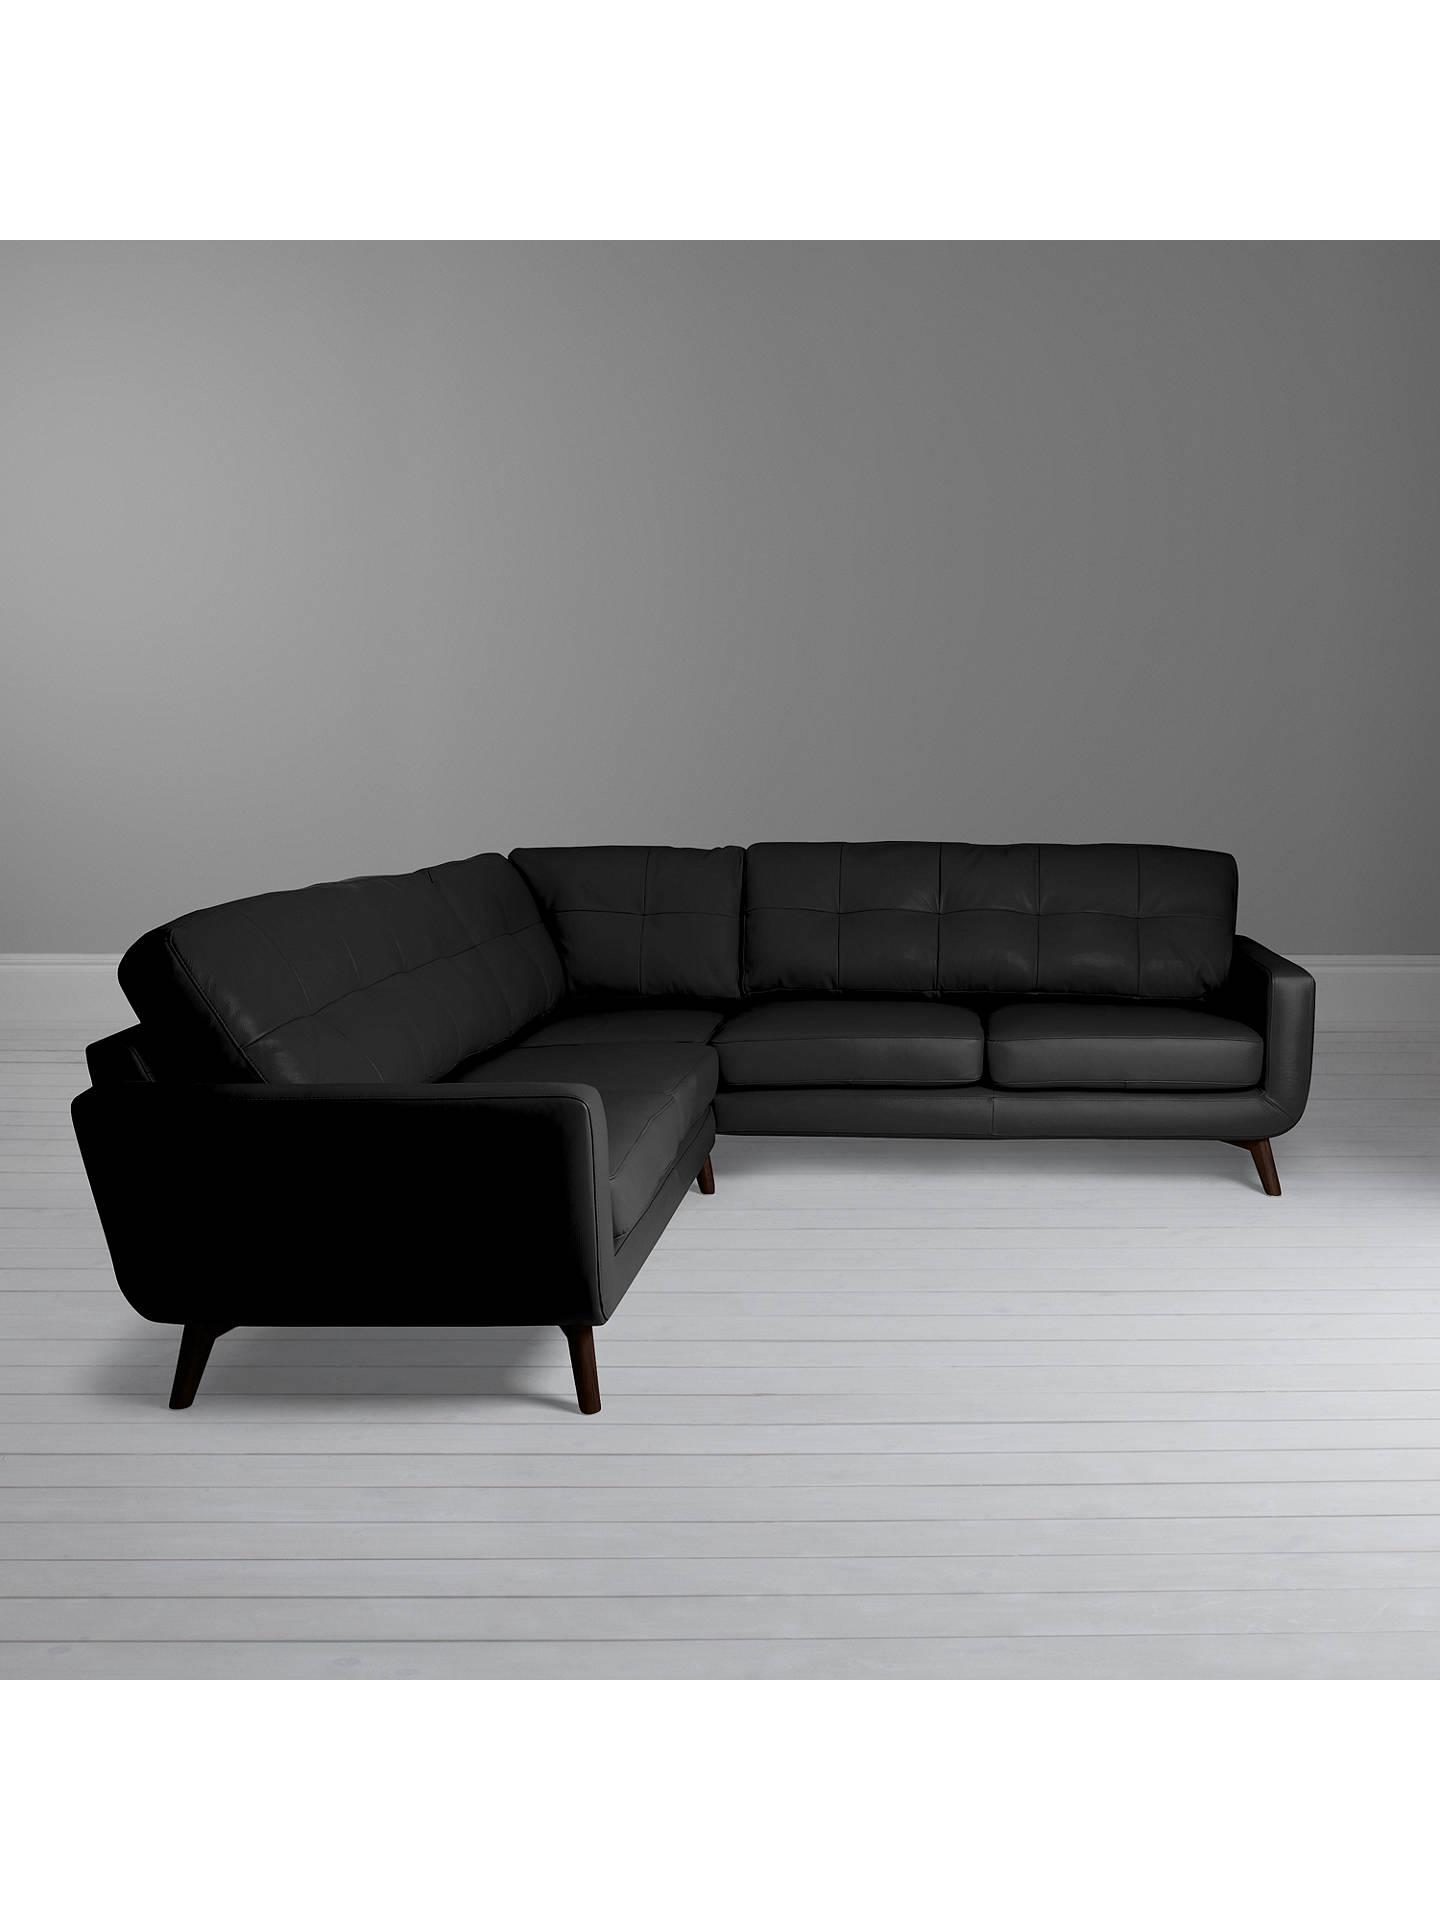 newest 44303 2114b John Lewis & Partners Barbican Leather Corner Sofa, Dark Leg, Contempo Black